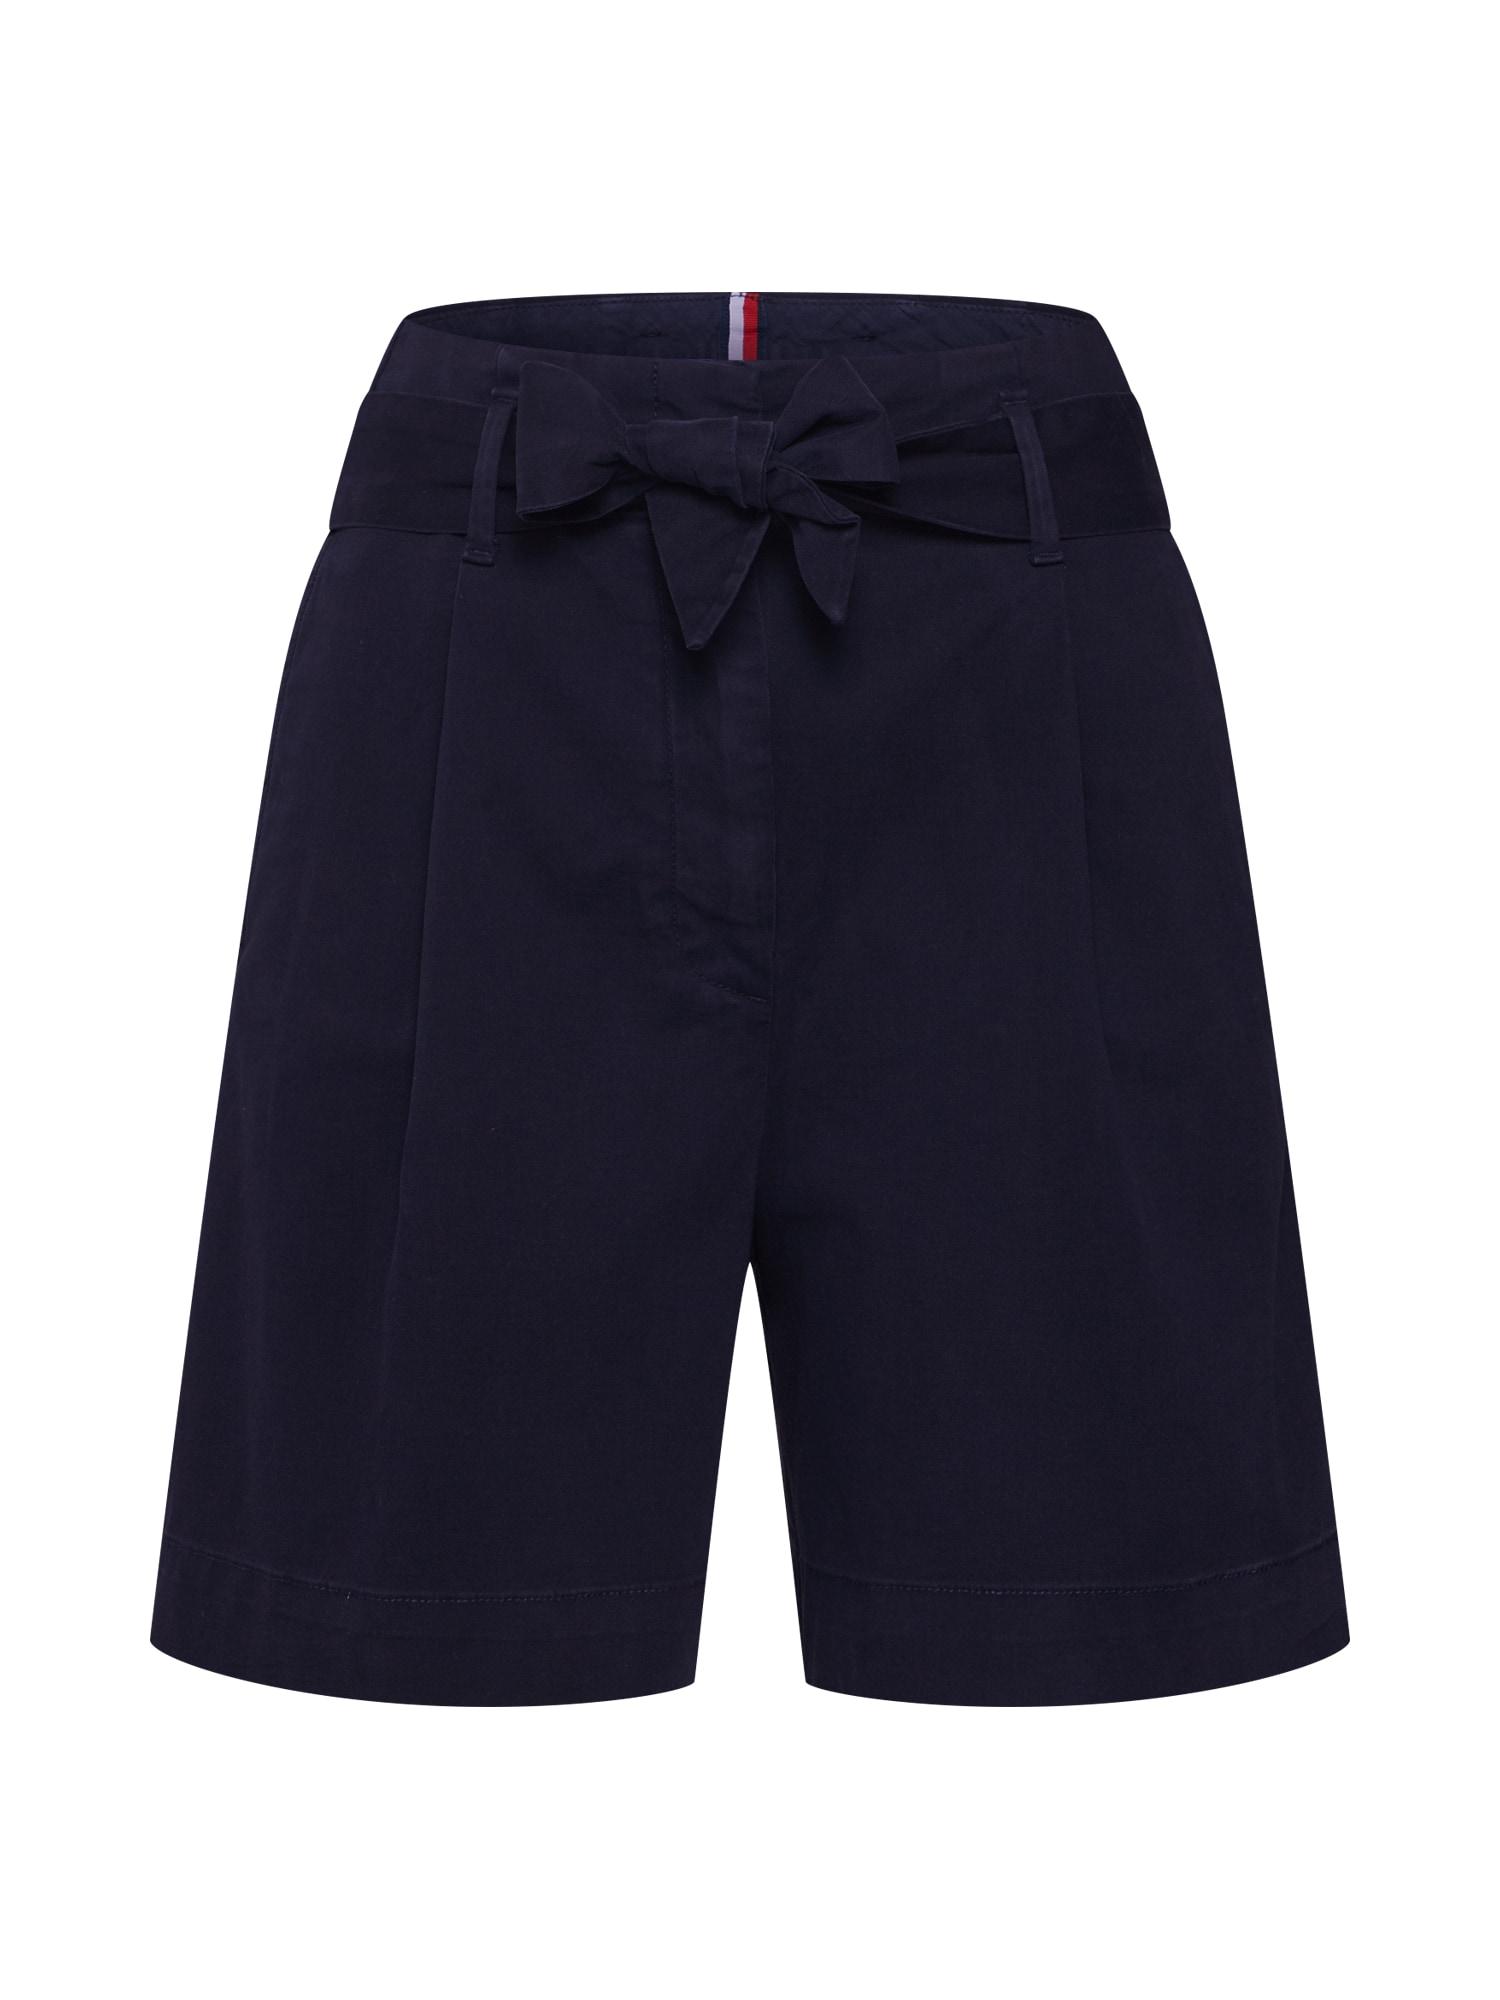 Kalhoty se sklady v pase Badu modrá marine modrá TOMMY HILFIGER